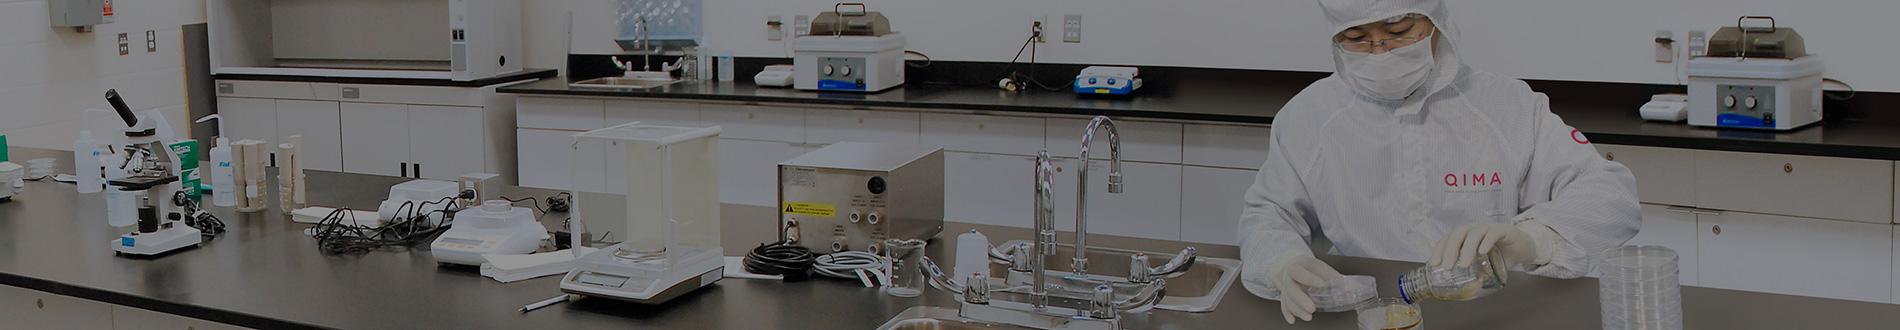 QIMA Food Testing Laboratory – Food Quality Labs